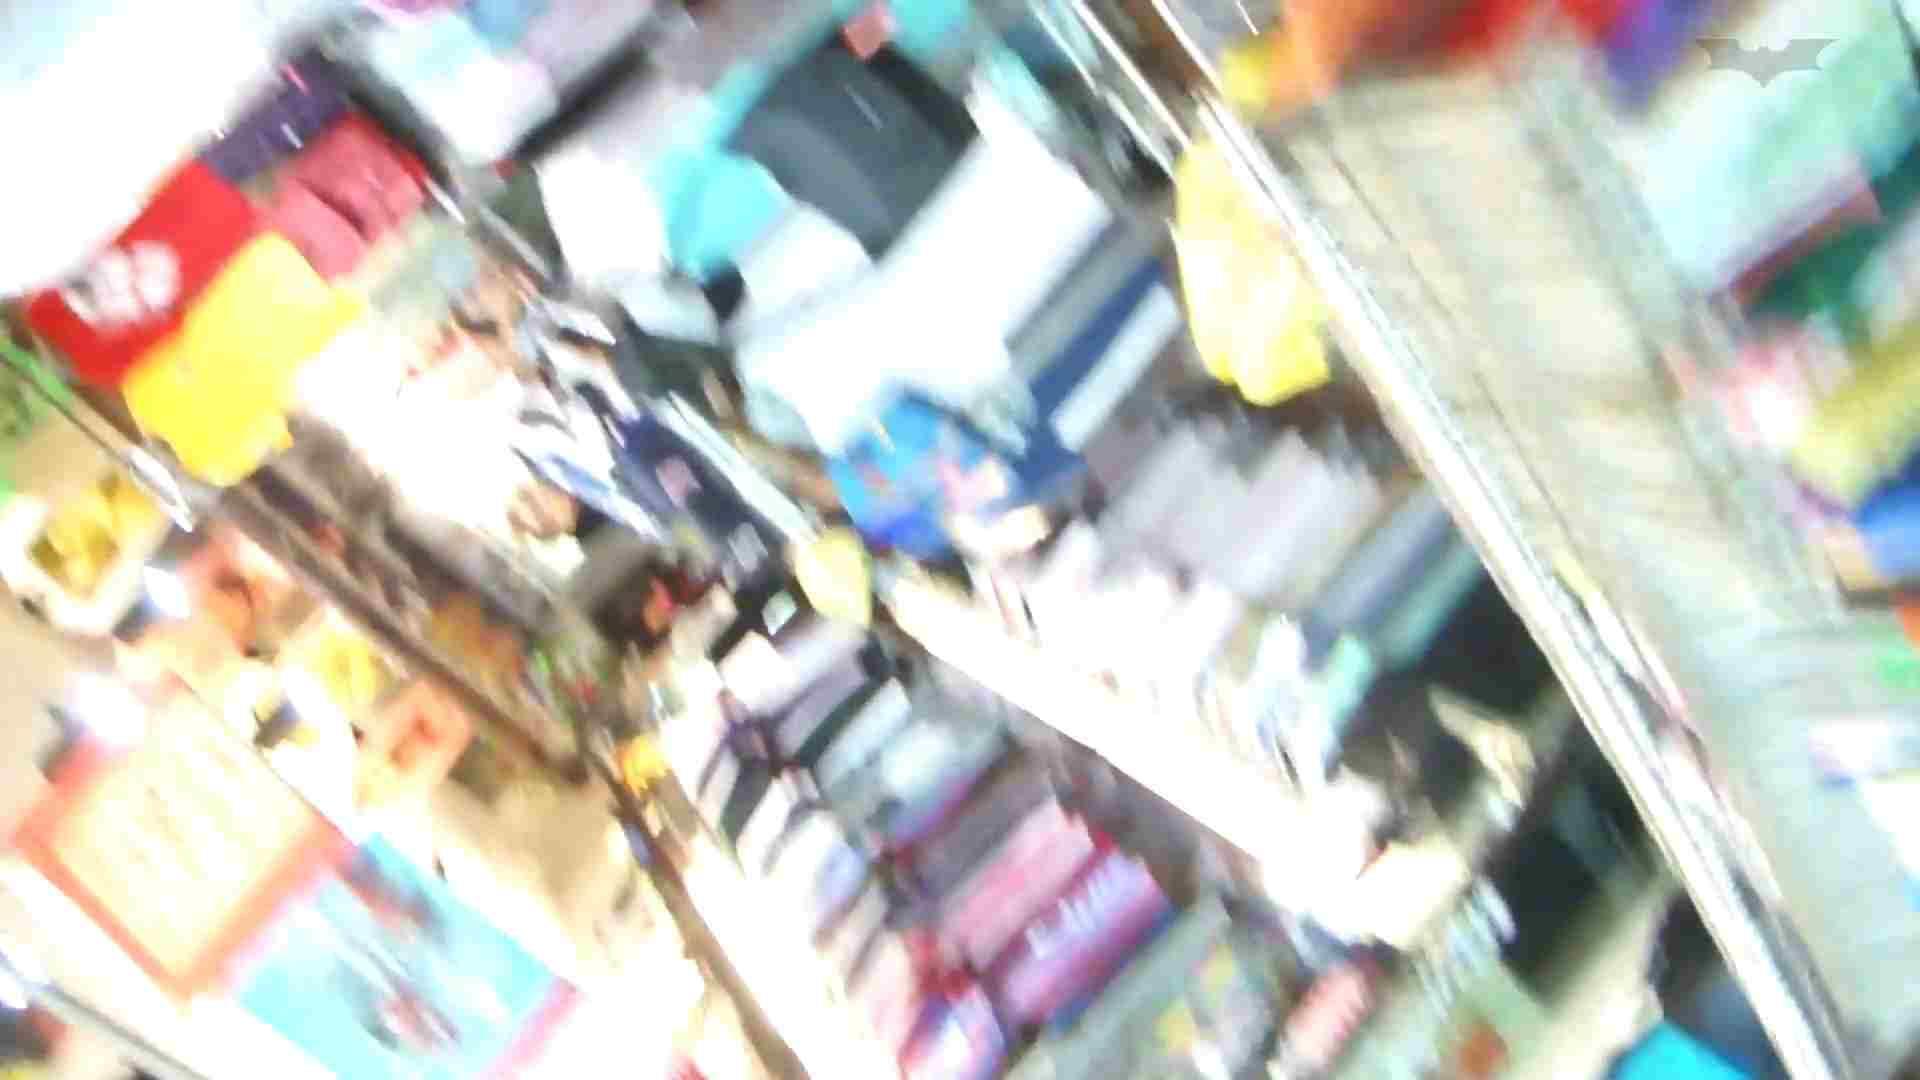 JD盗撮 美女の洗面所の秘密 Vol.79 高画質 おめこ無修正画像 76枚 72